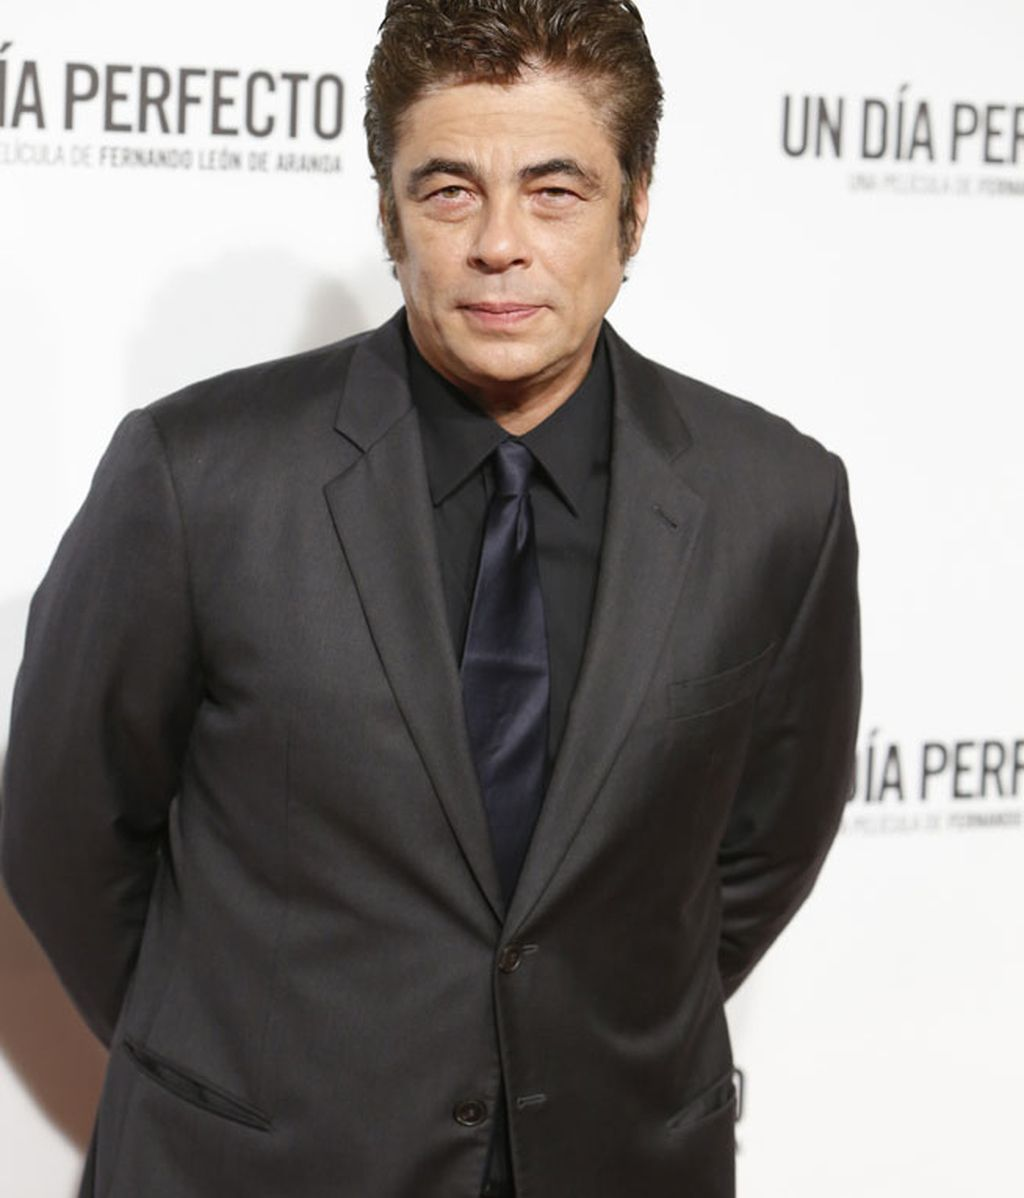 Benicio del Toro optó por una corbata azul marino